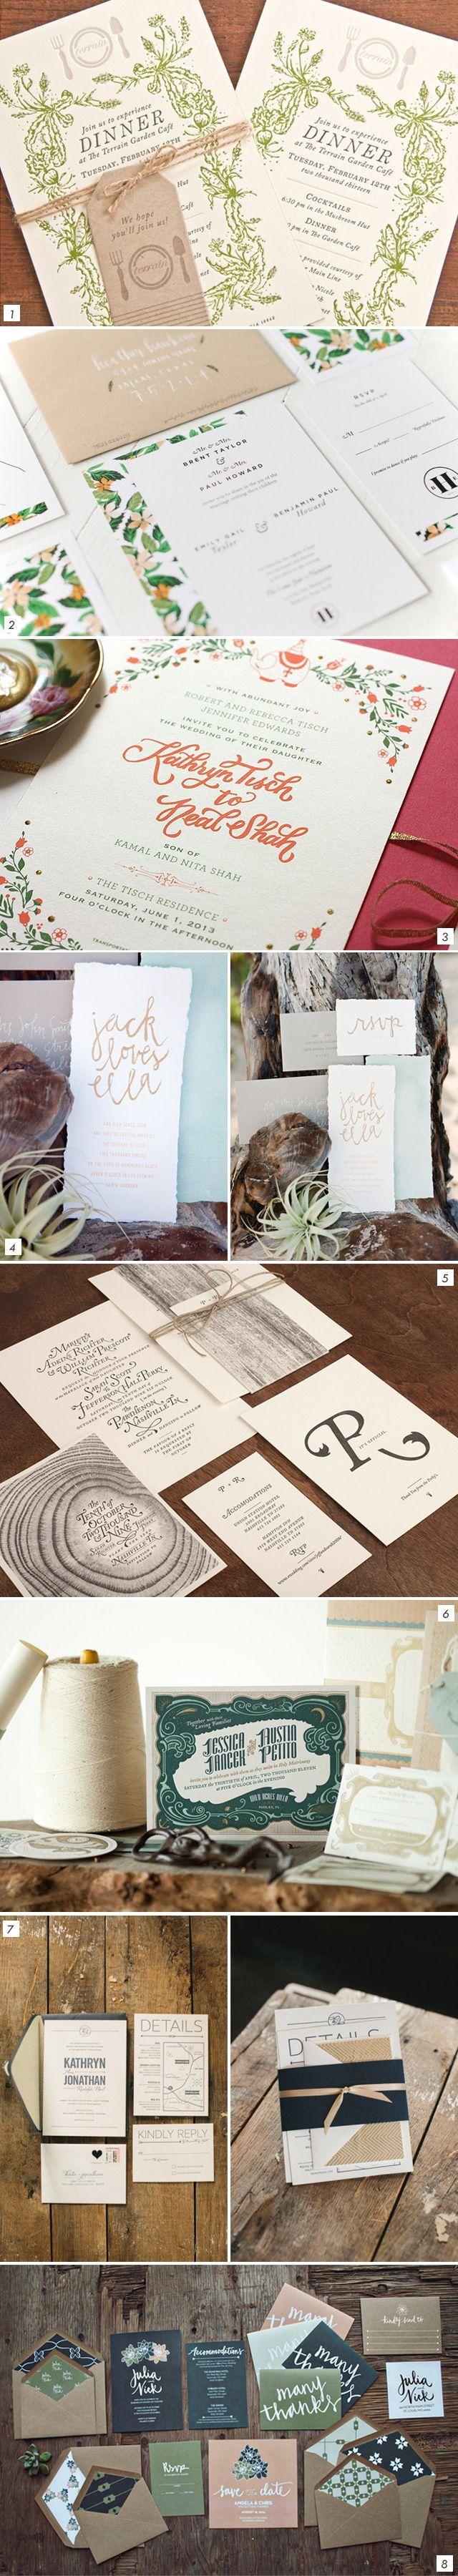 top wedding invitations016%0A    x    xbe  e        f          jpg